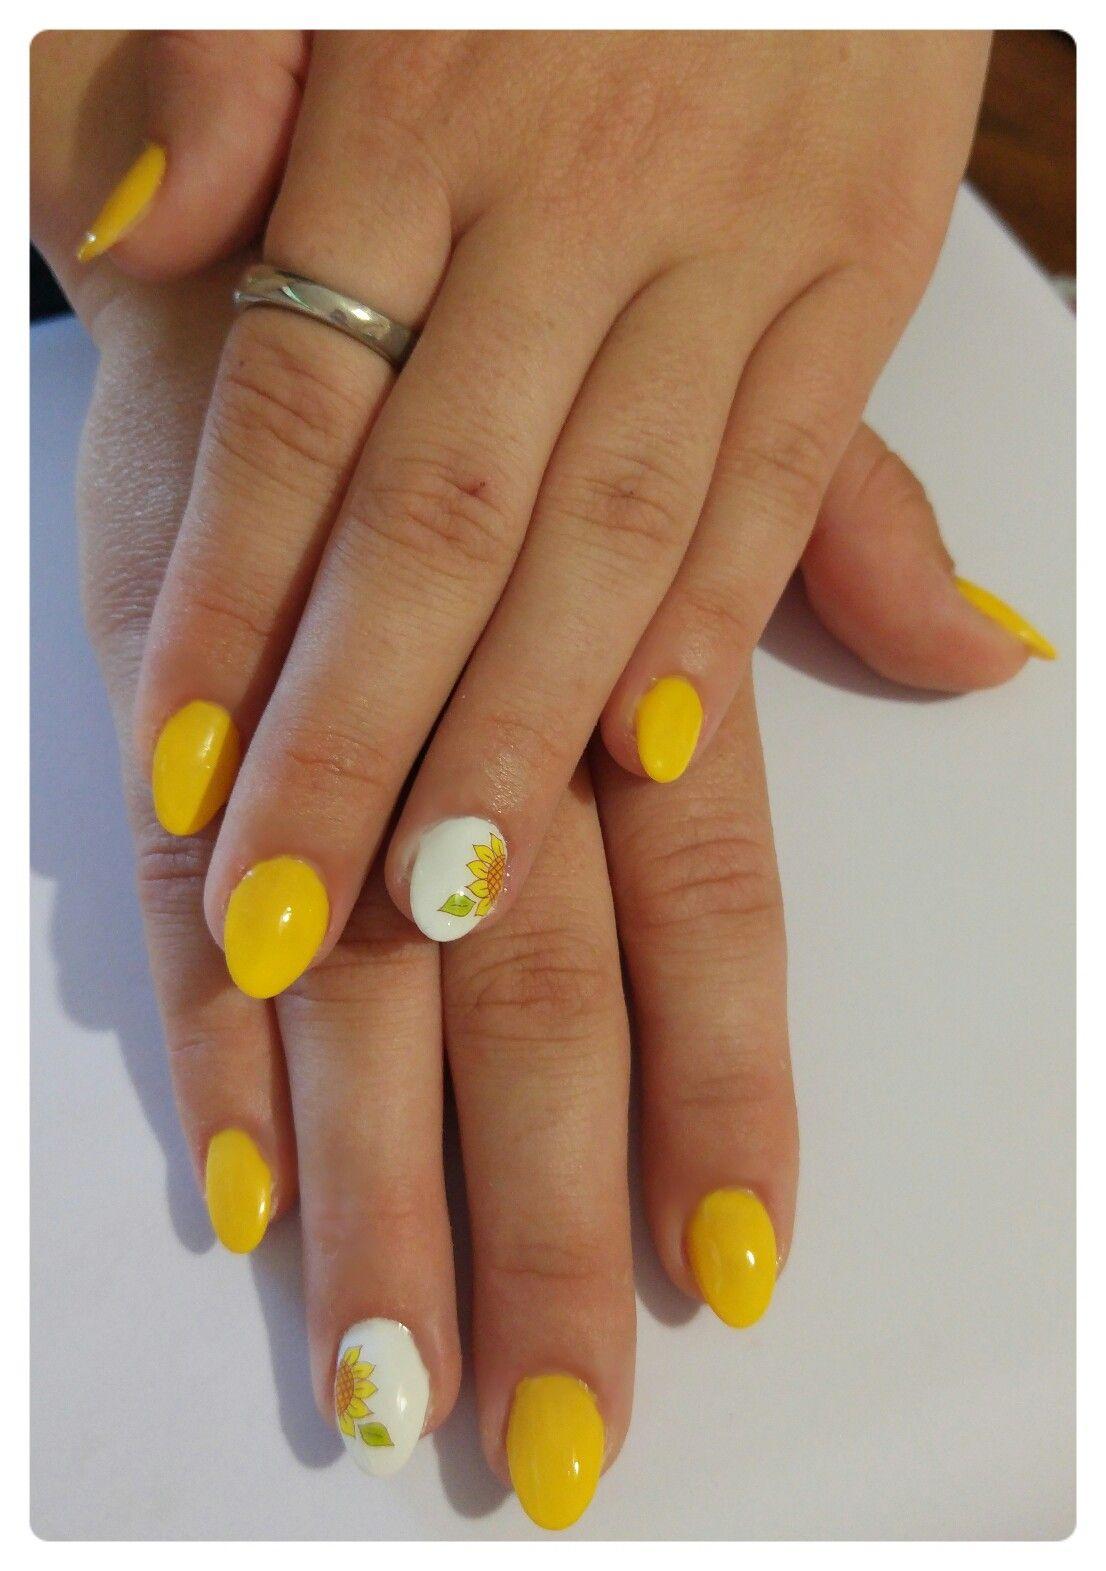 Giallo (sun island) bianco girasole Sole, Convenience Store, Nail Art